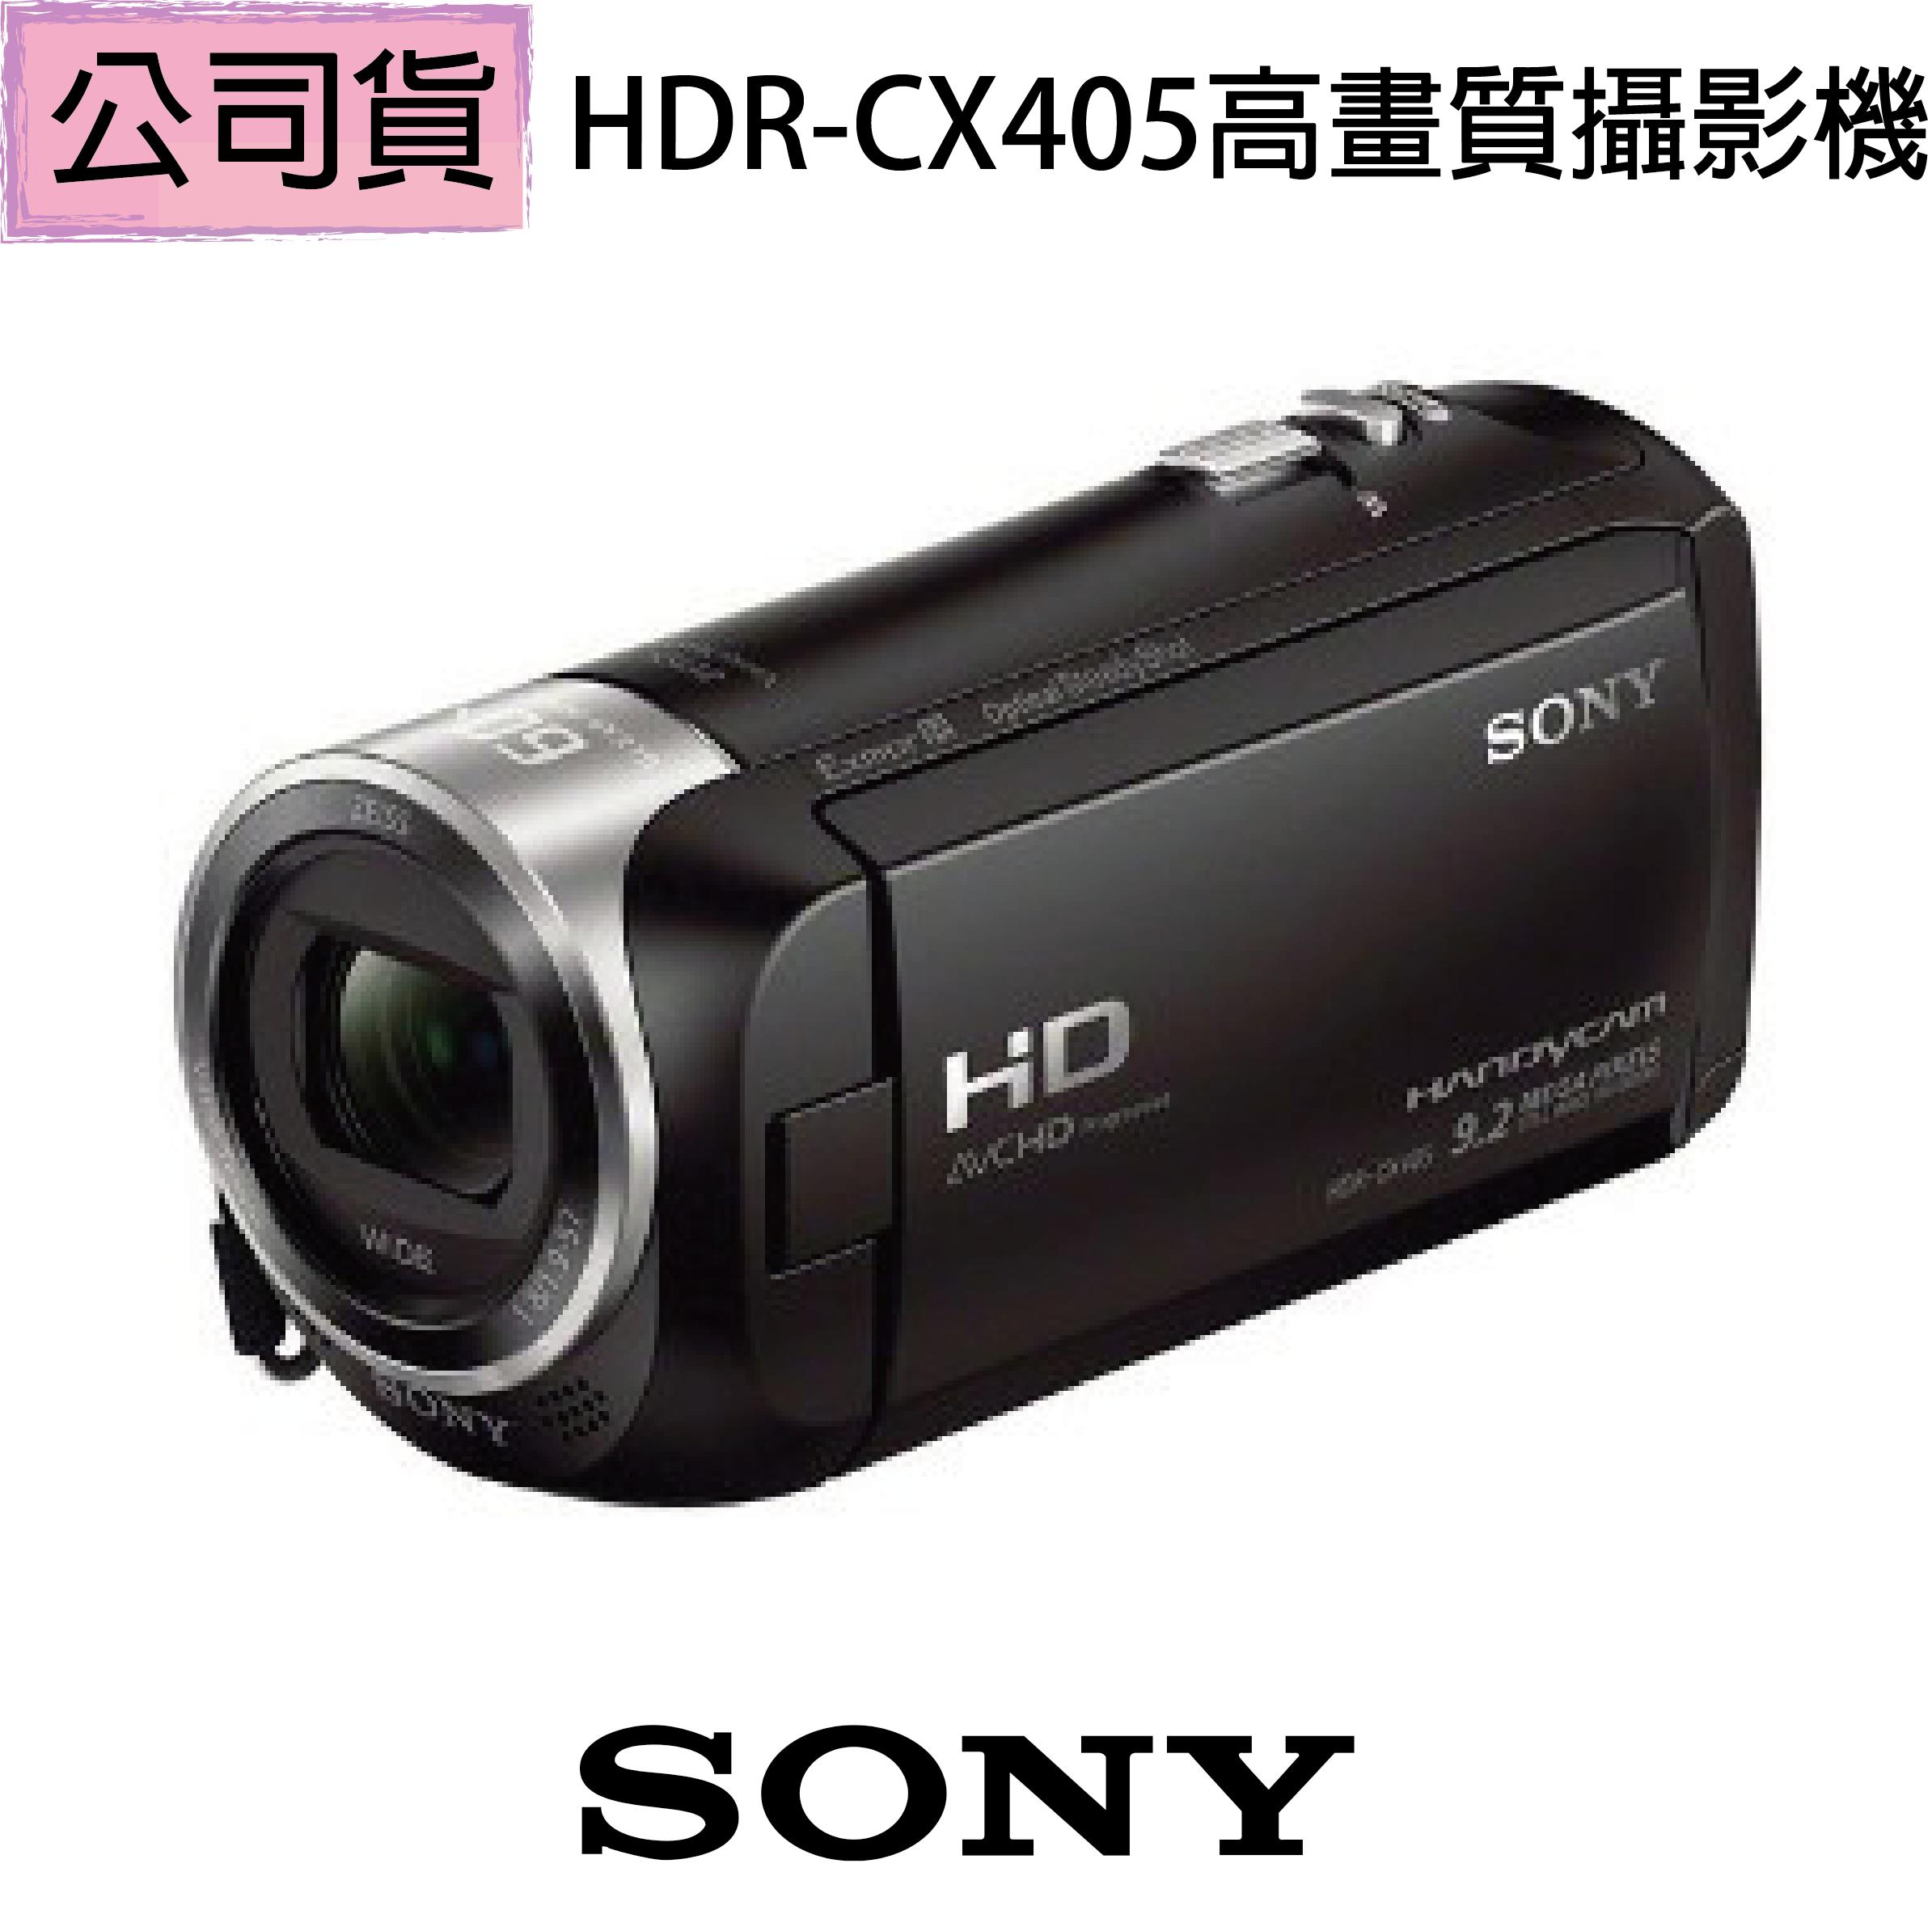 贈【SanDisk 64G 原電超值組】【SONY】HDR-CX405高畫質攝影機(公司貨)